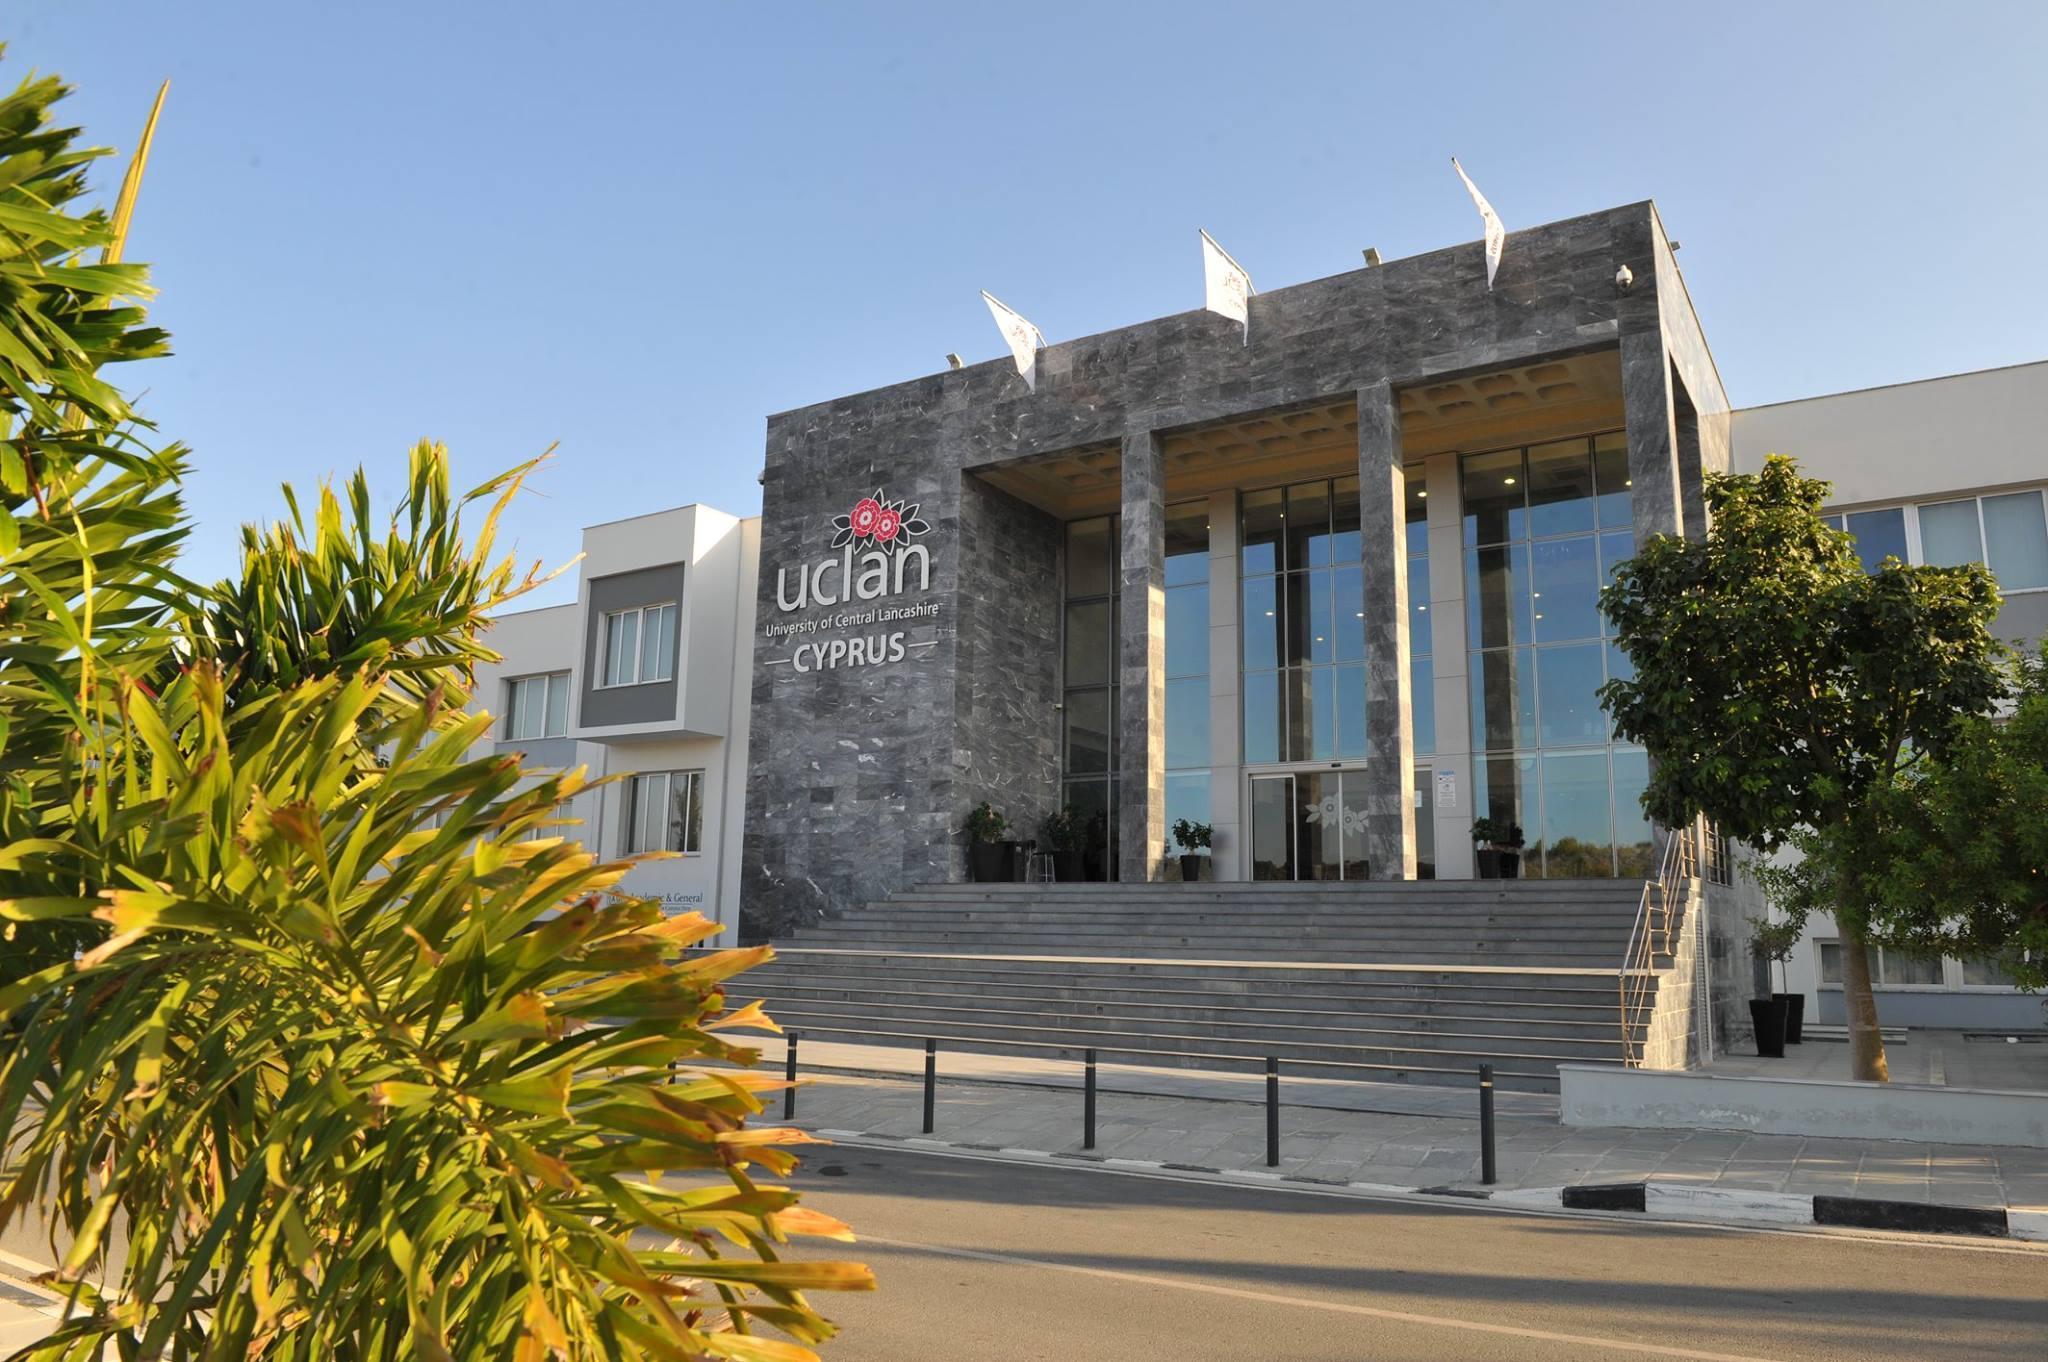 UCLan Cyprus